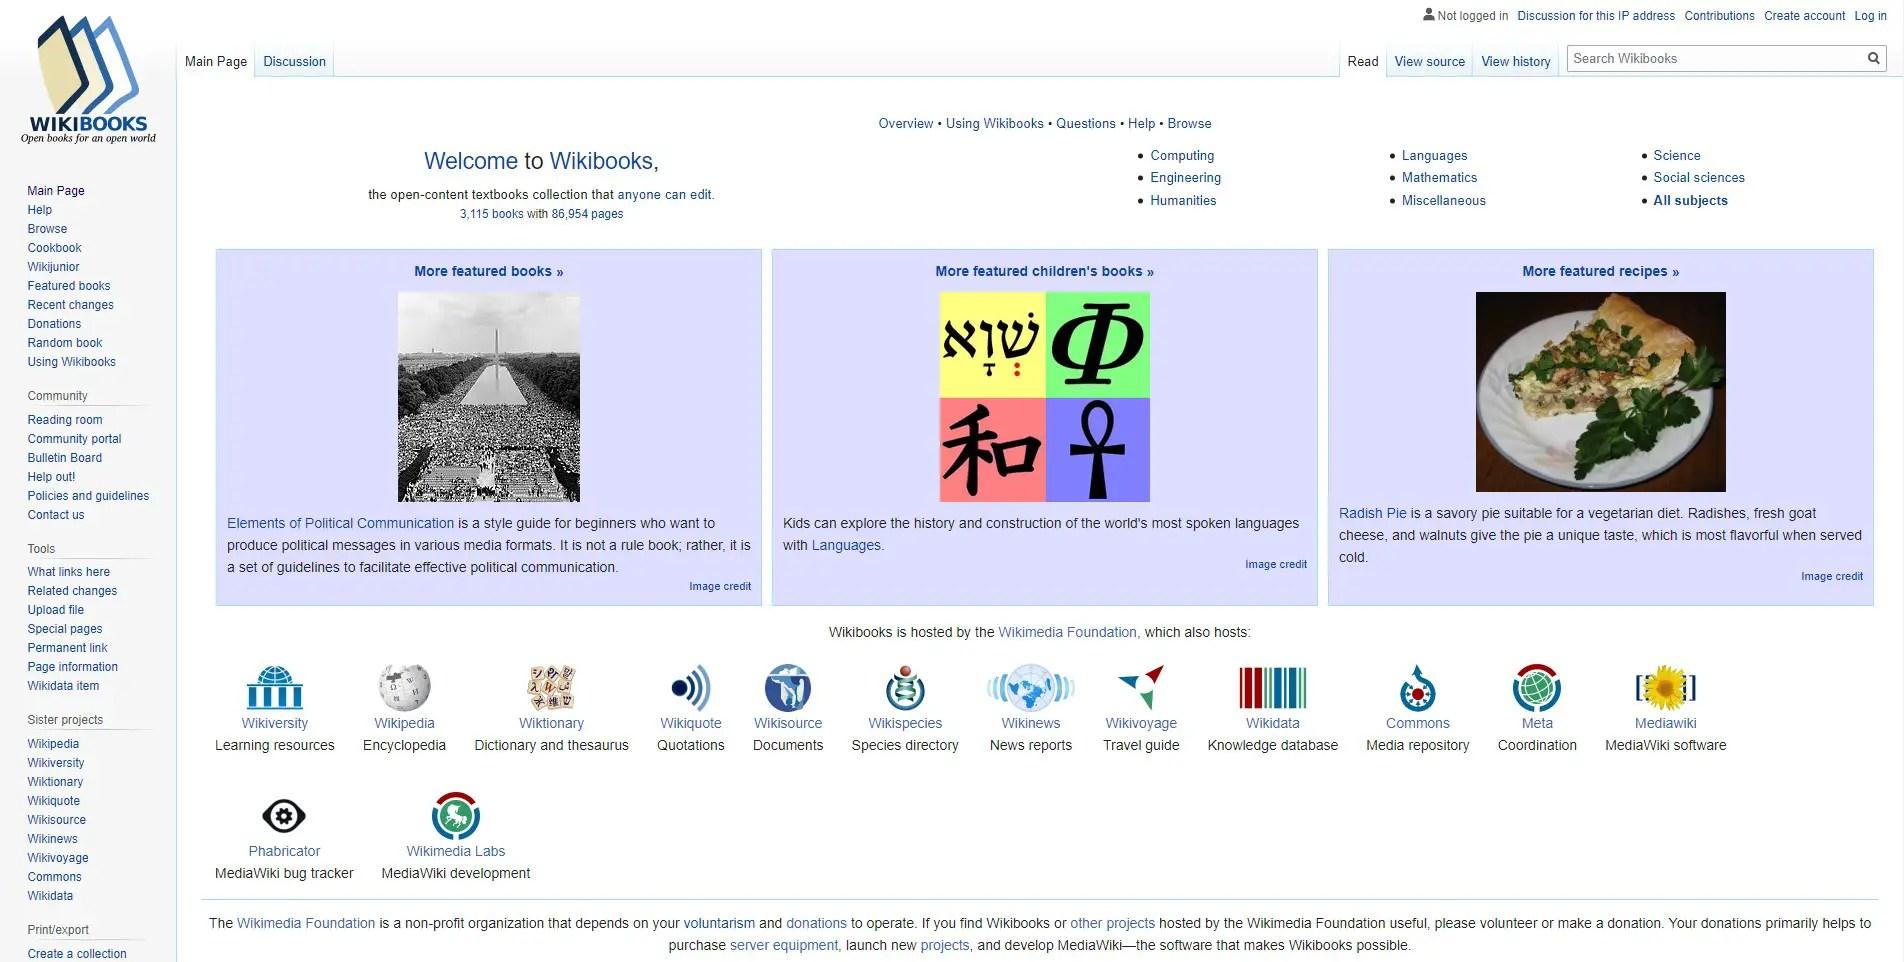 wikibooks.org-download-free-pdf-textbooks